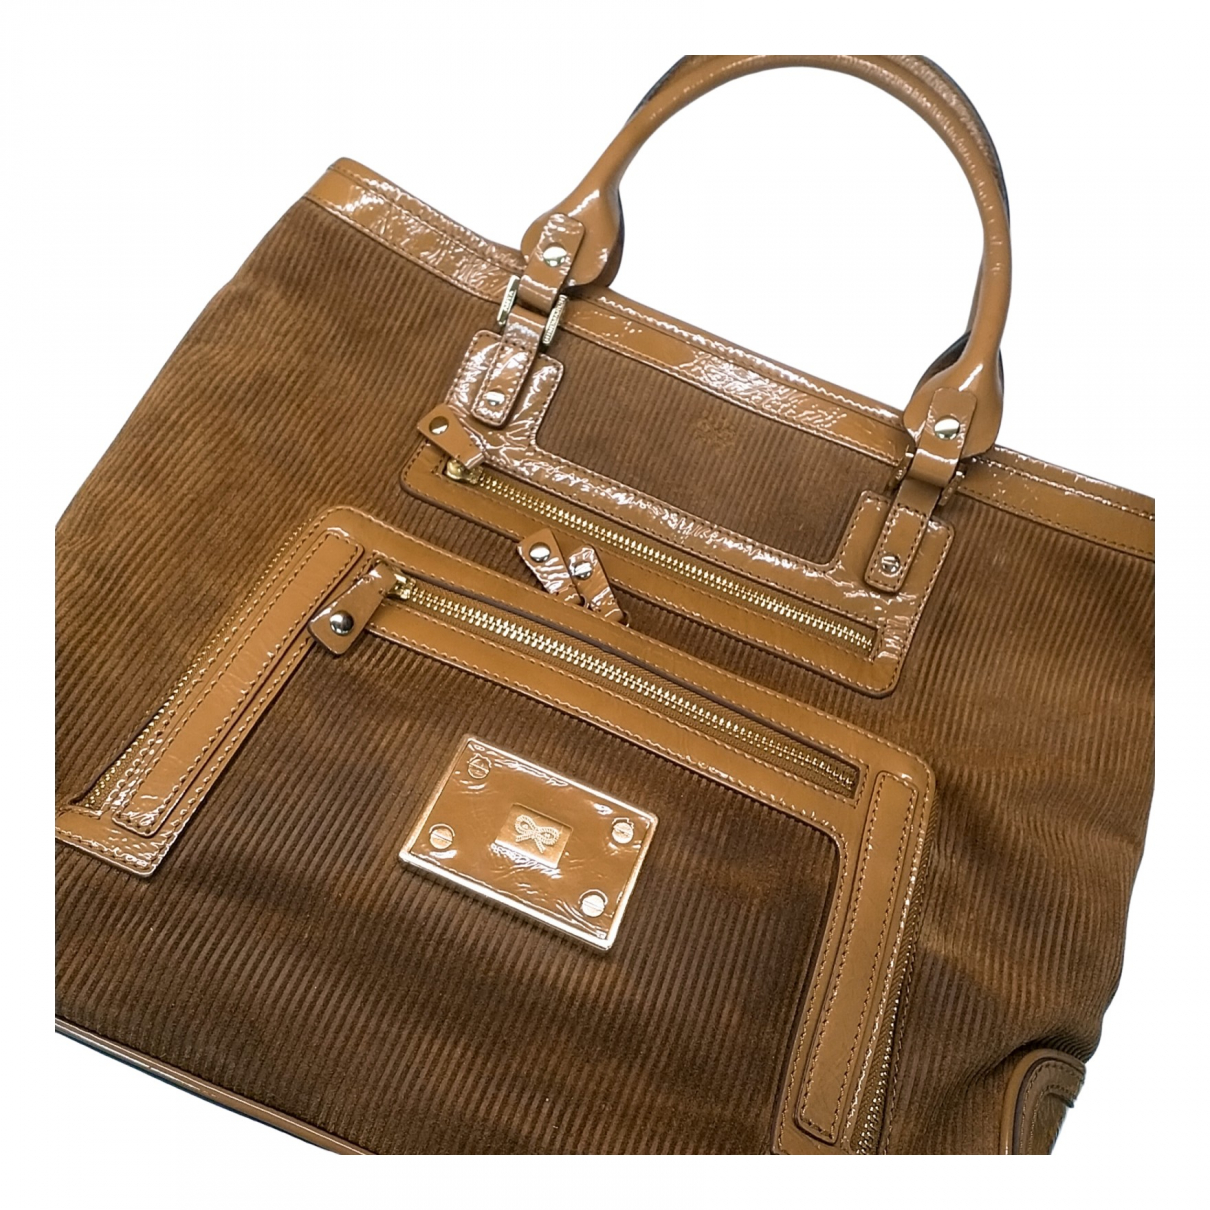 Anya Hindmarch N Brown Velvet handbag for Women N